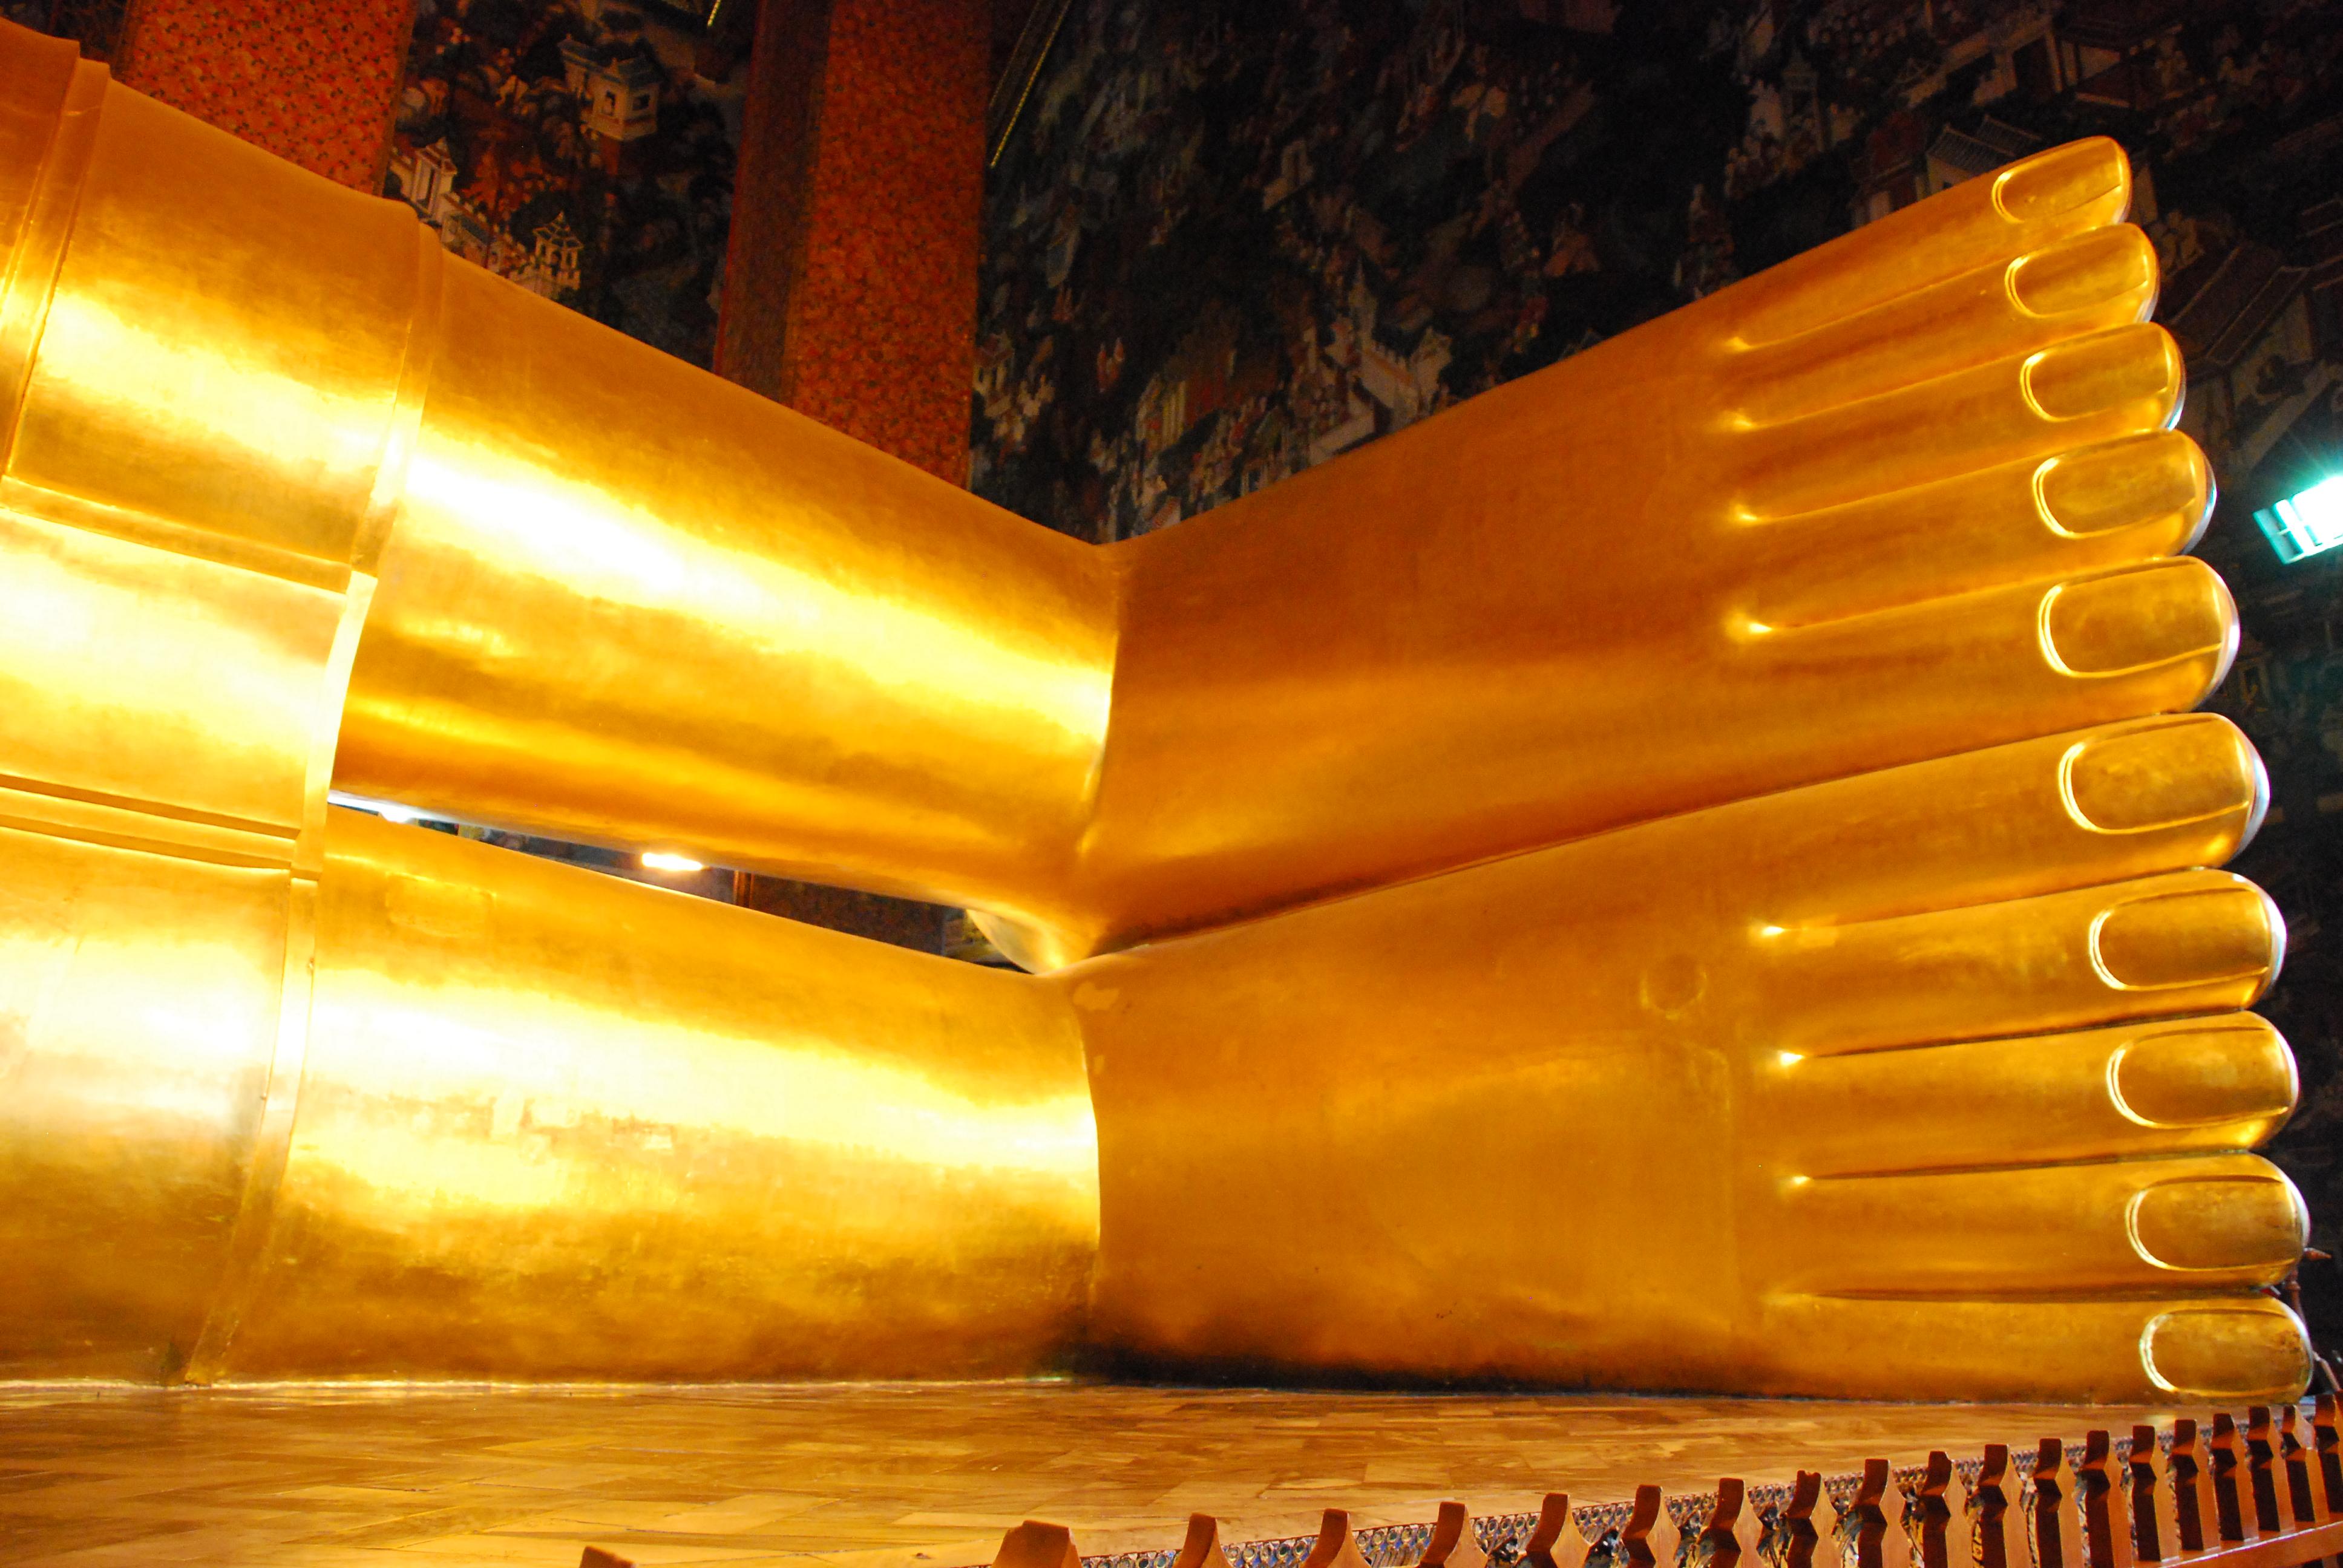 Thailandia: tempio Wat Pho - Bangkok di zibadrona